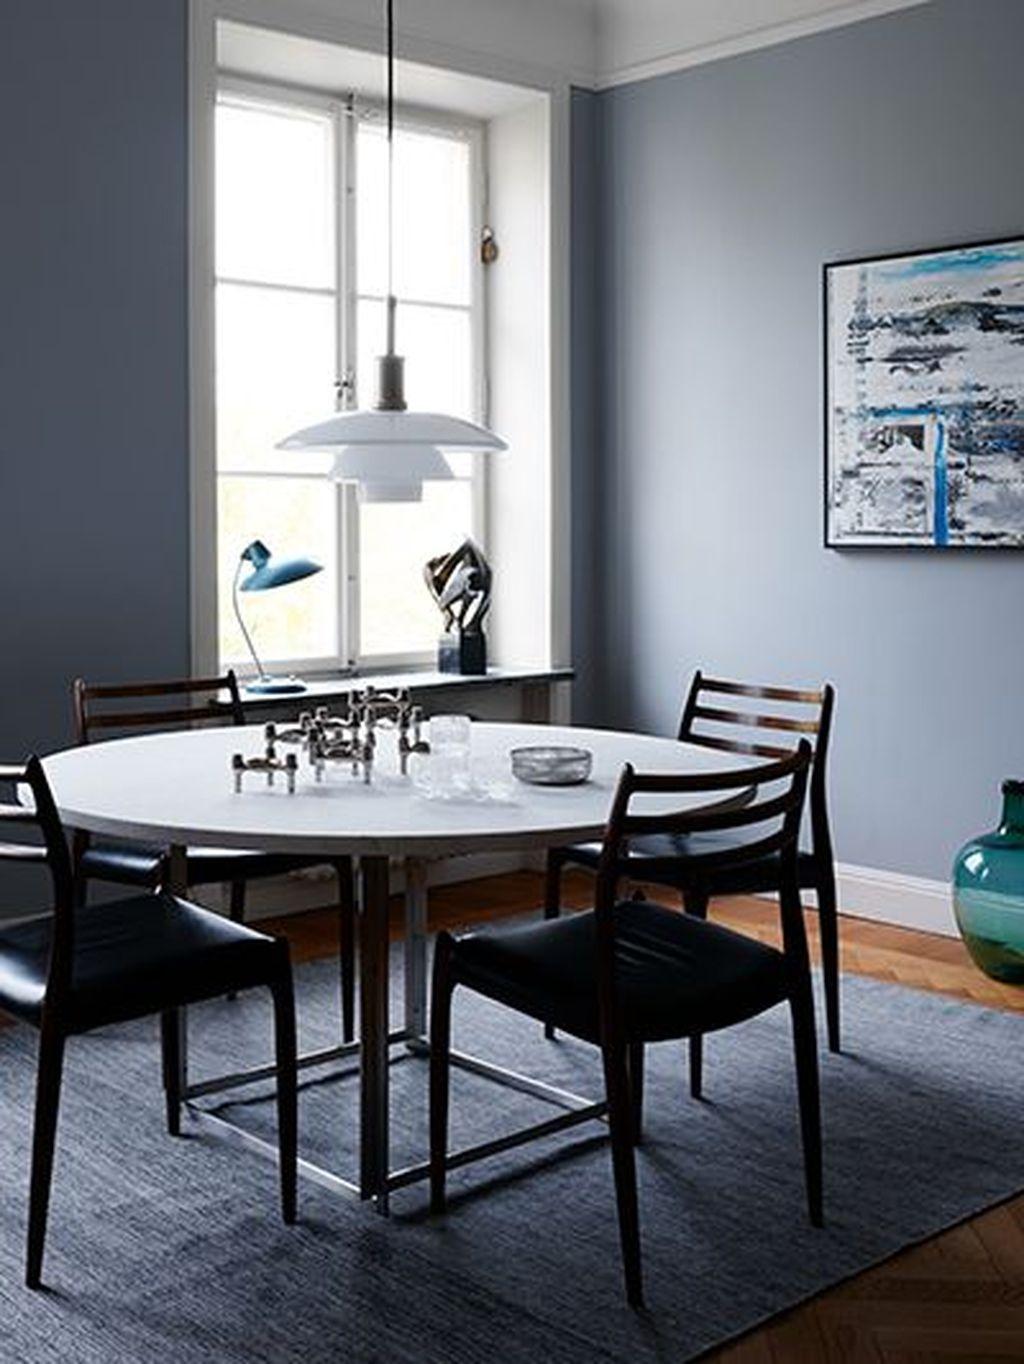 Delightufl Residence Design Ideas With Mid Century Scandinavian To Have 06